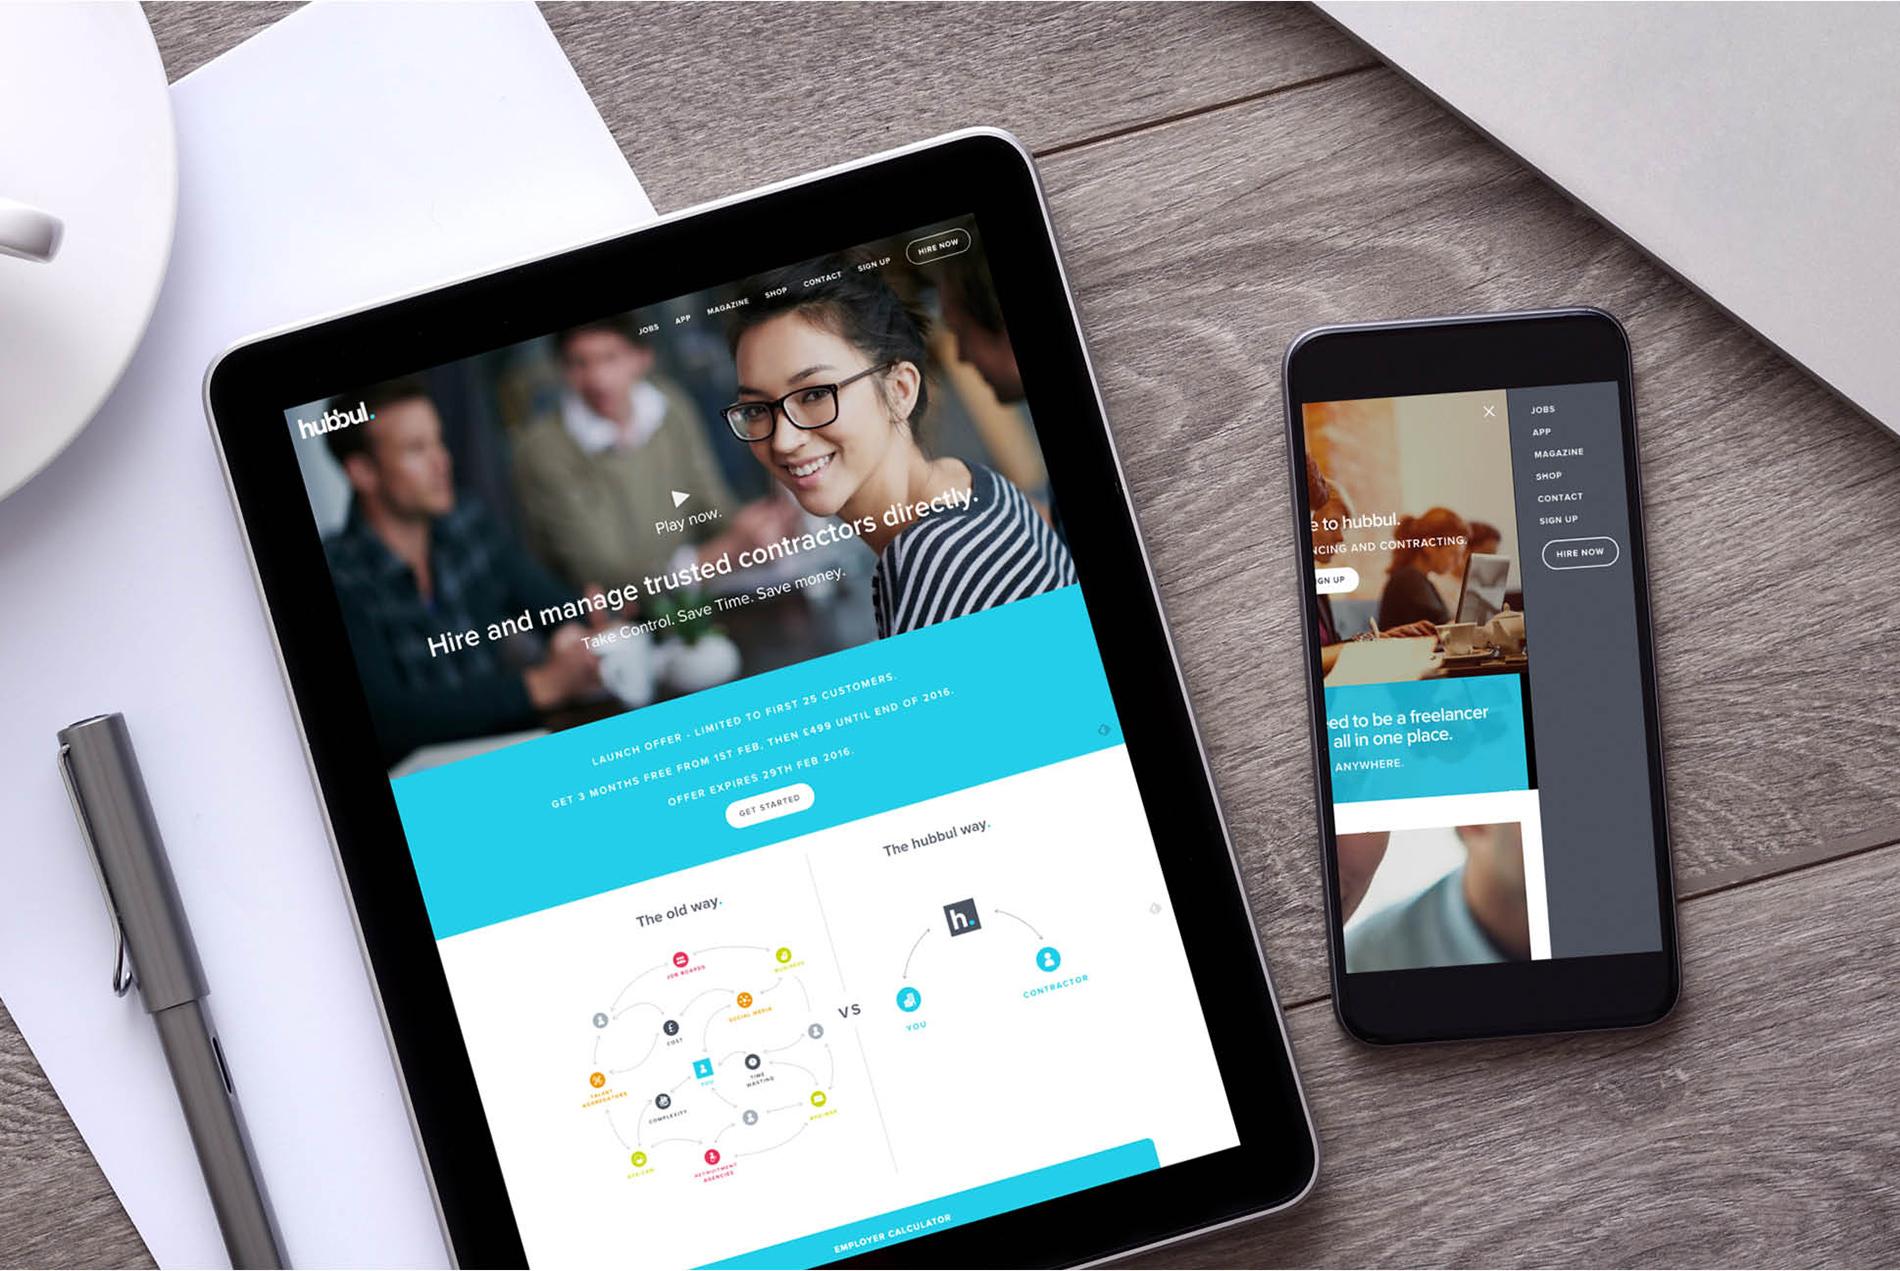 website design | Branding, Strategy and Logo Design | Independent Marketing | IM London | London Branding Agency